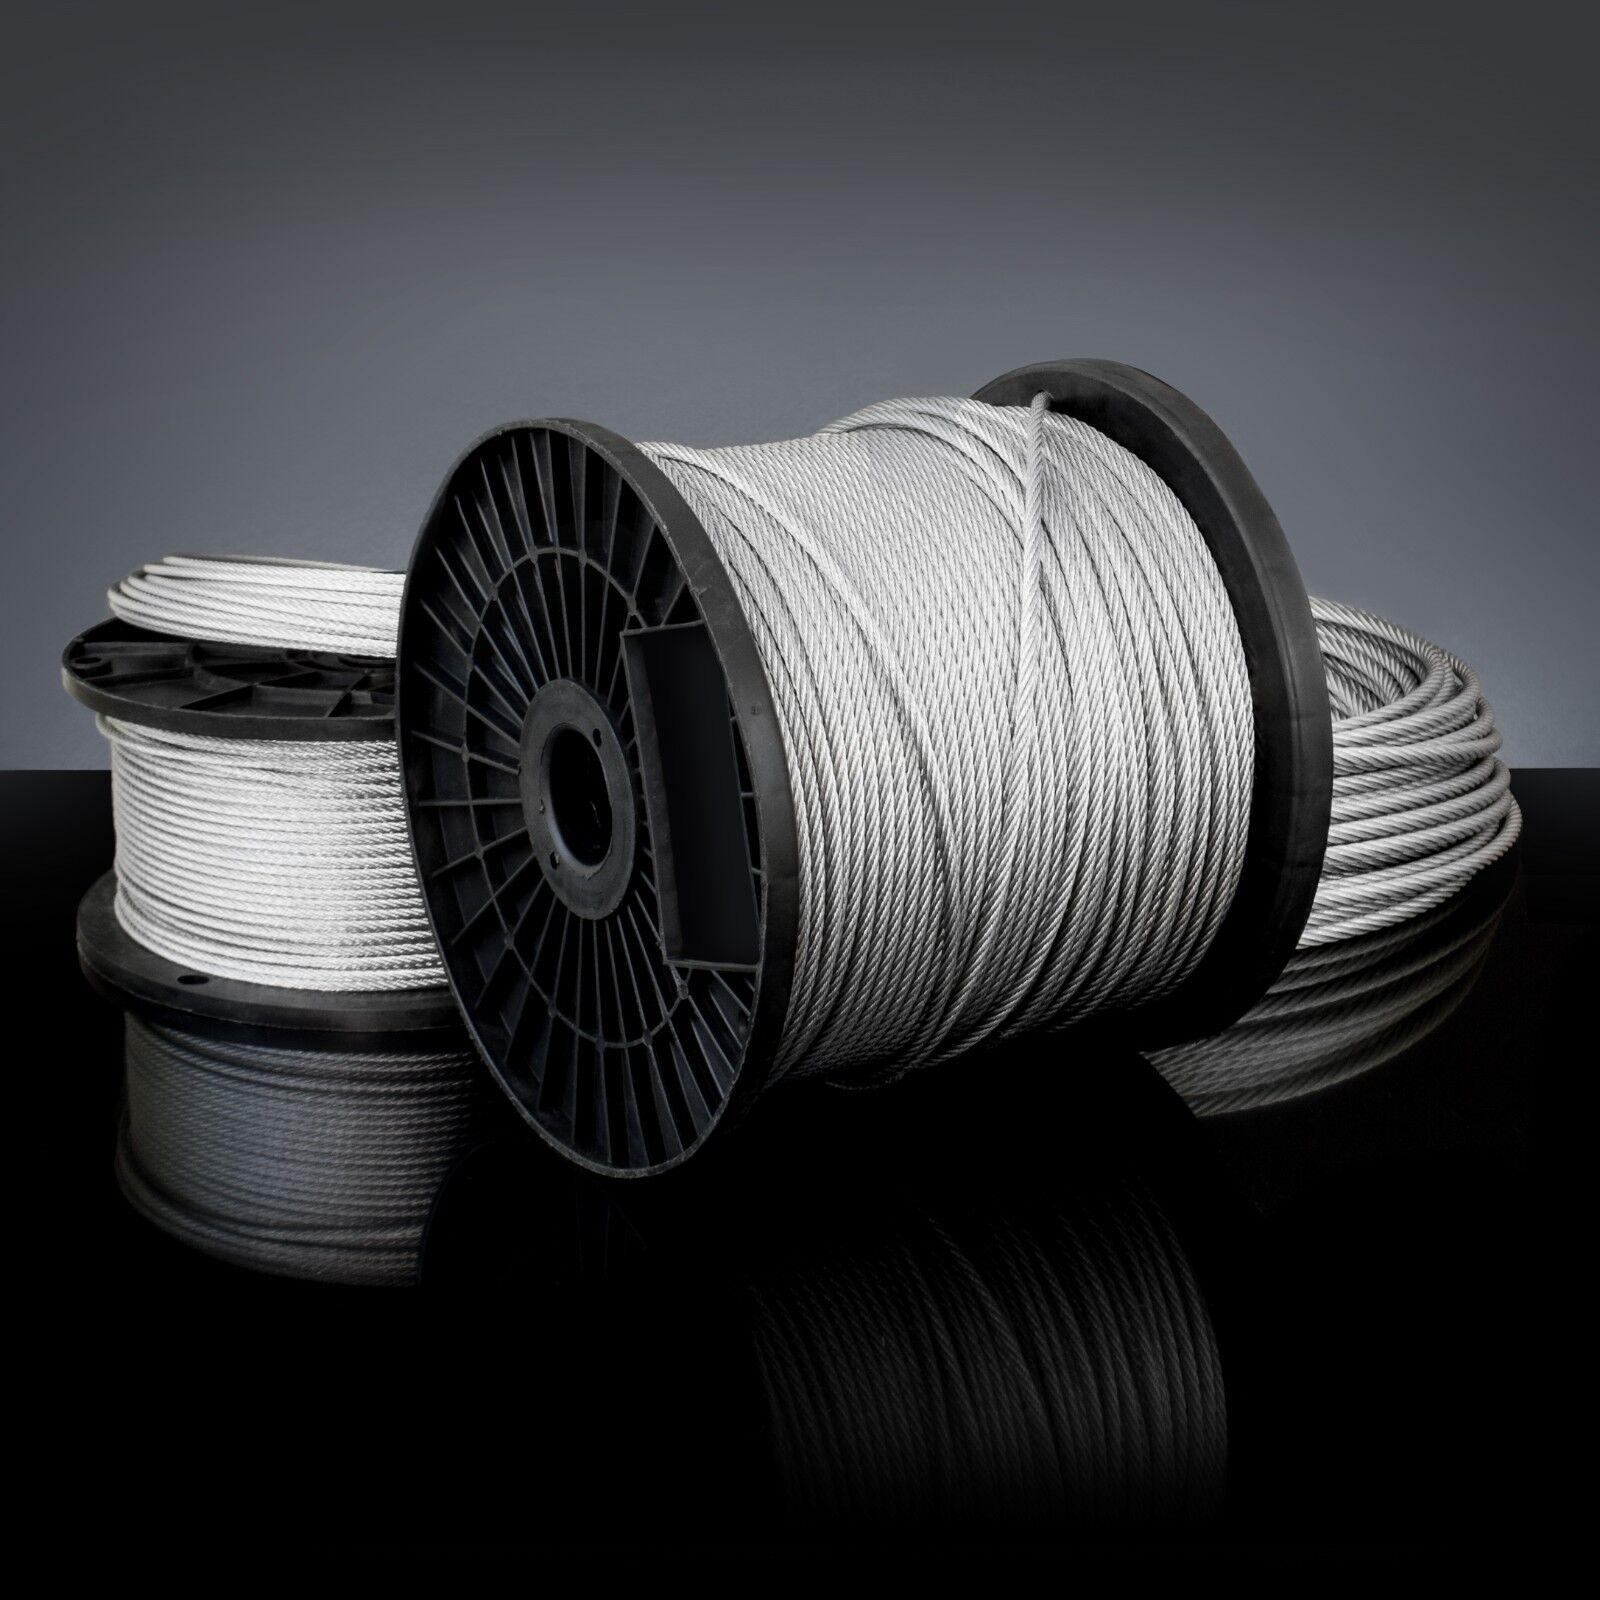 10m DRAHTSEIL 12mm 6x37 Seil Draht Stahlseil verzinkt Seil Draht Drahtseile DIN